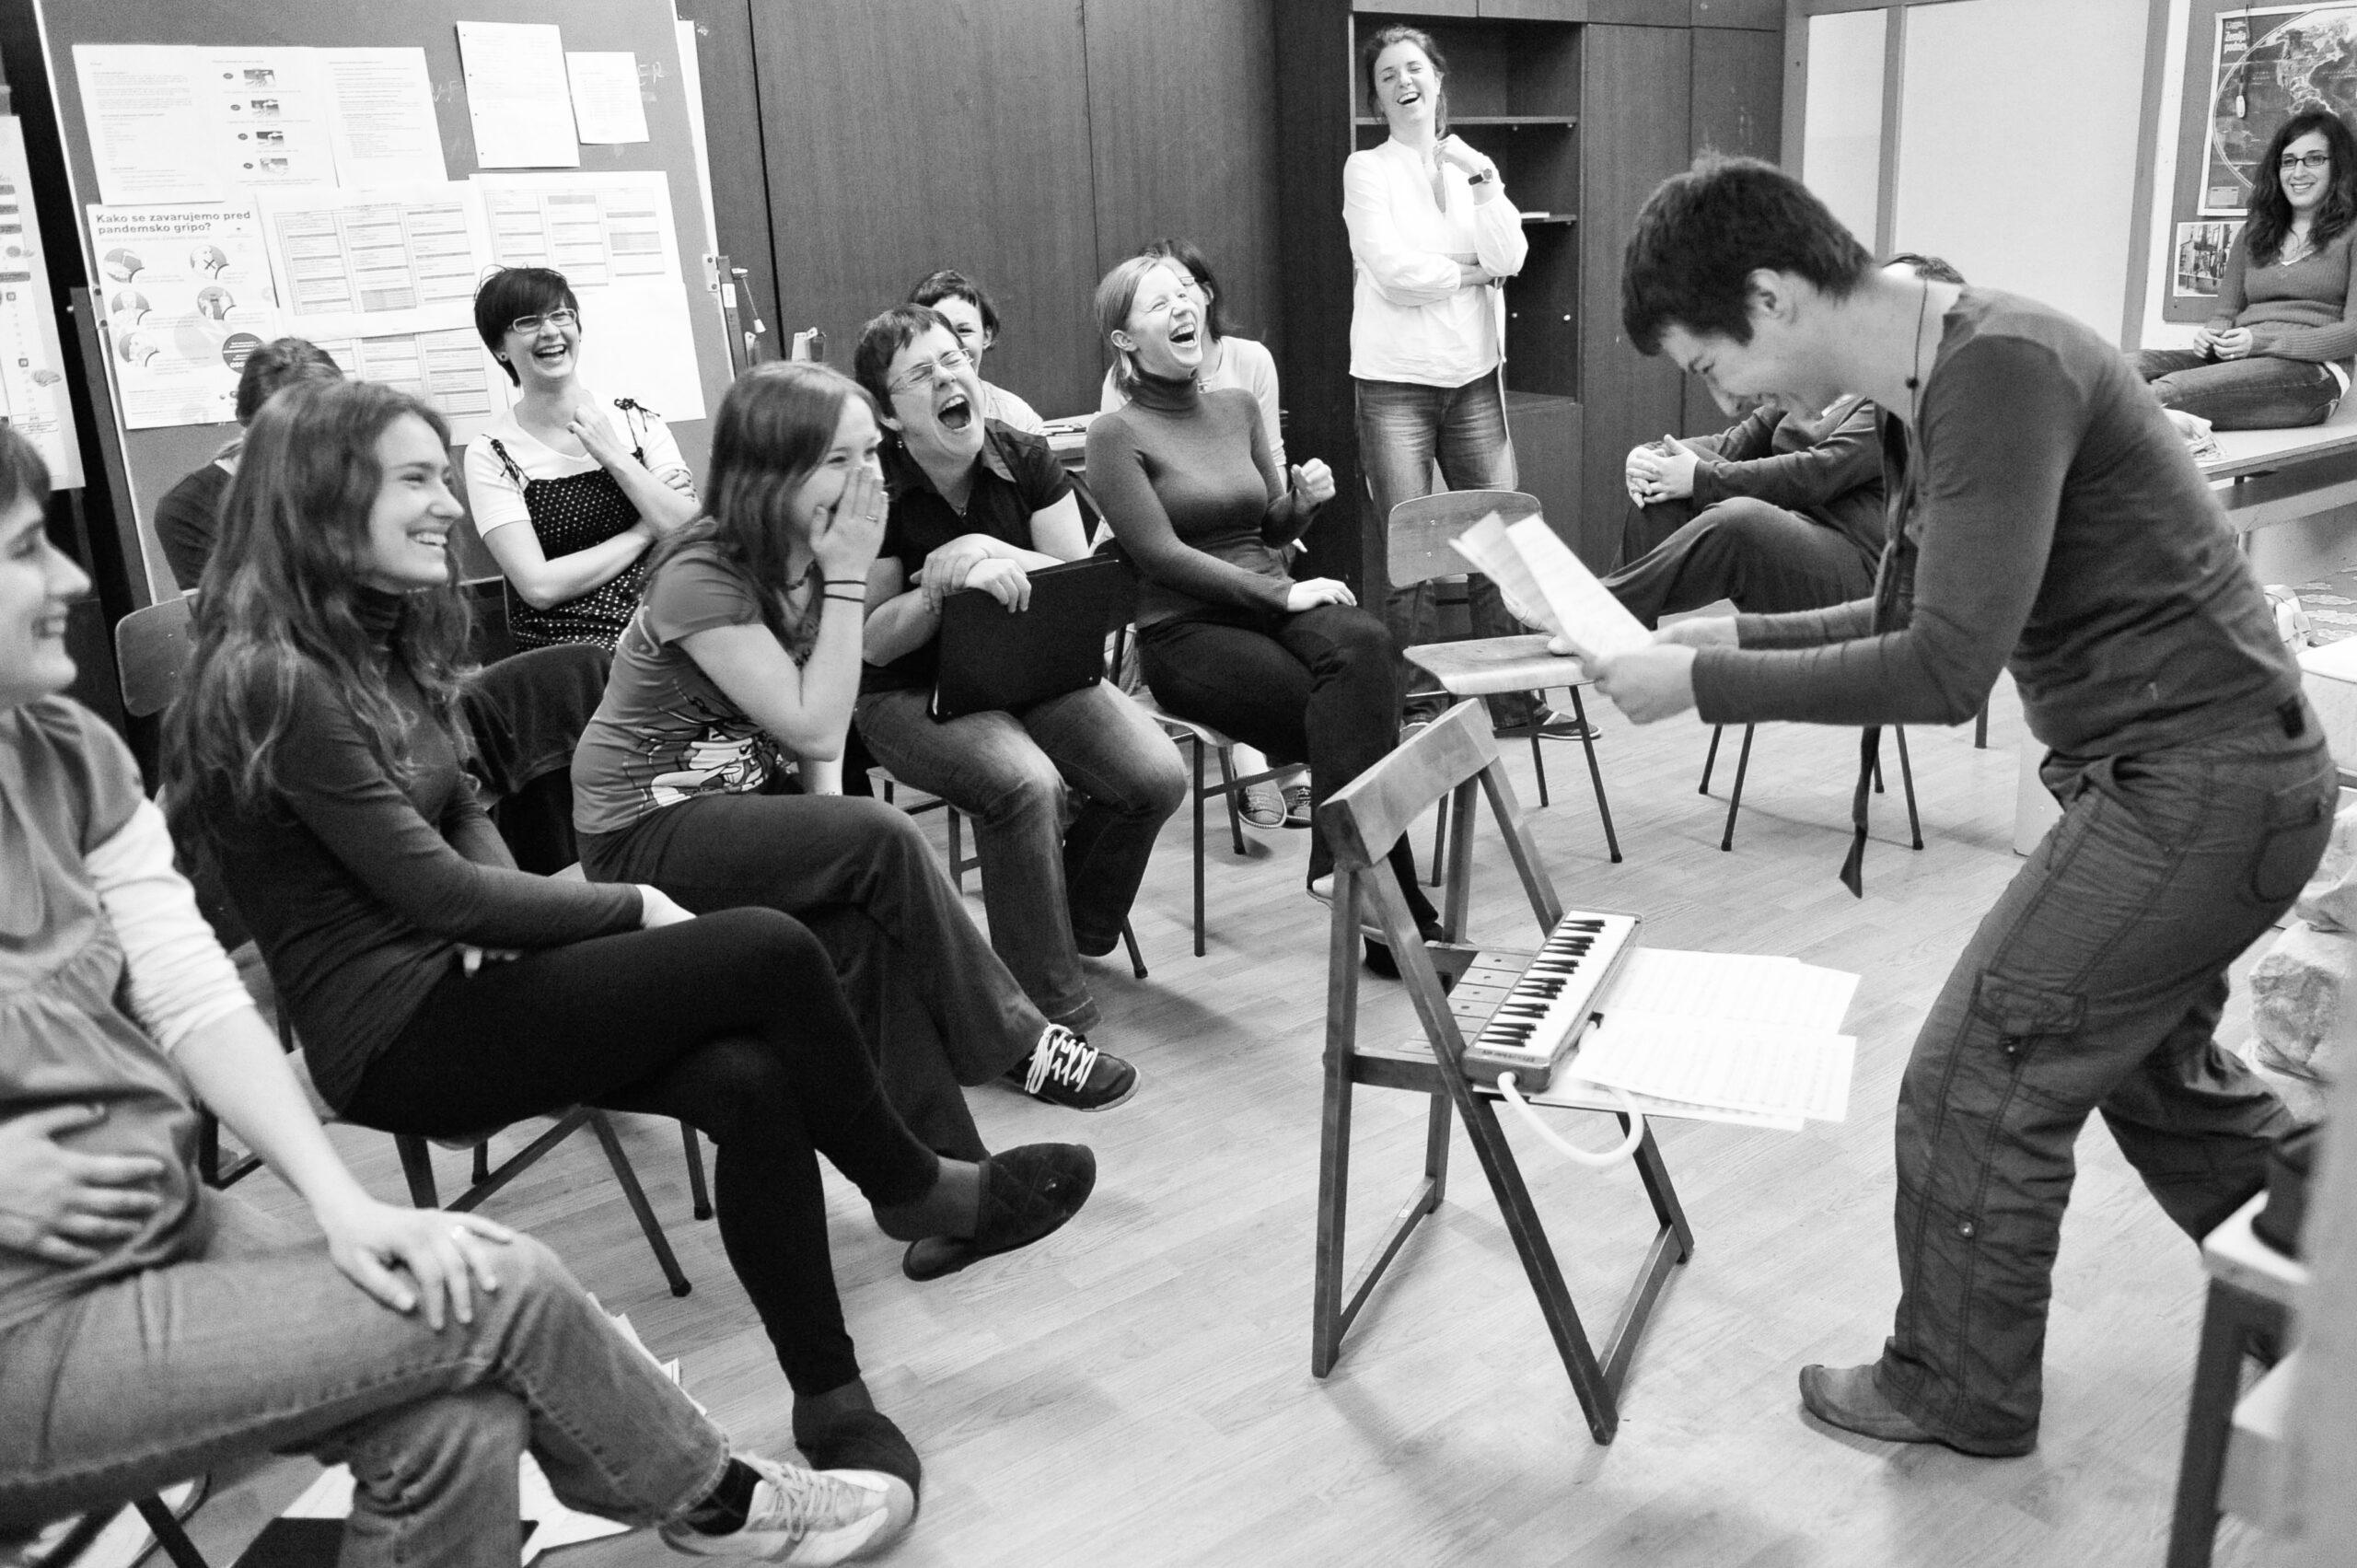 Jana Jocif, Slovenia: Final Instructions, Grudnove Šmikle, Slovenia - Conductor Marjeta Naglič gives the final instructions for song interpretation at a national choral competition Naša pesem 2010 in Maribor.